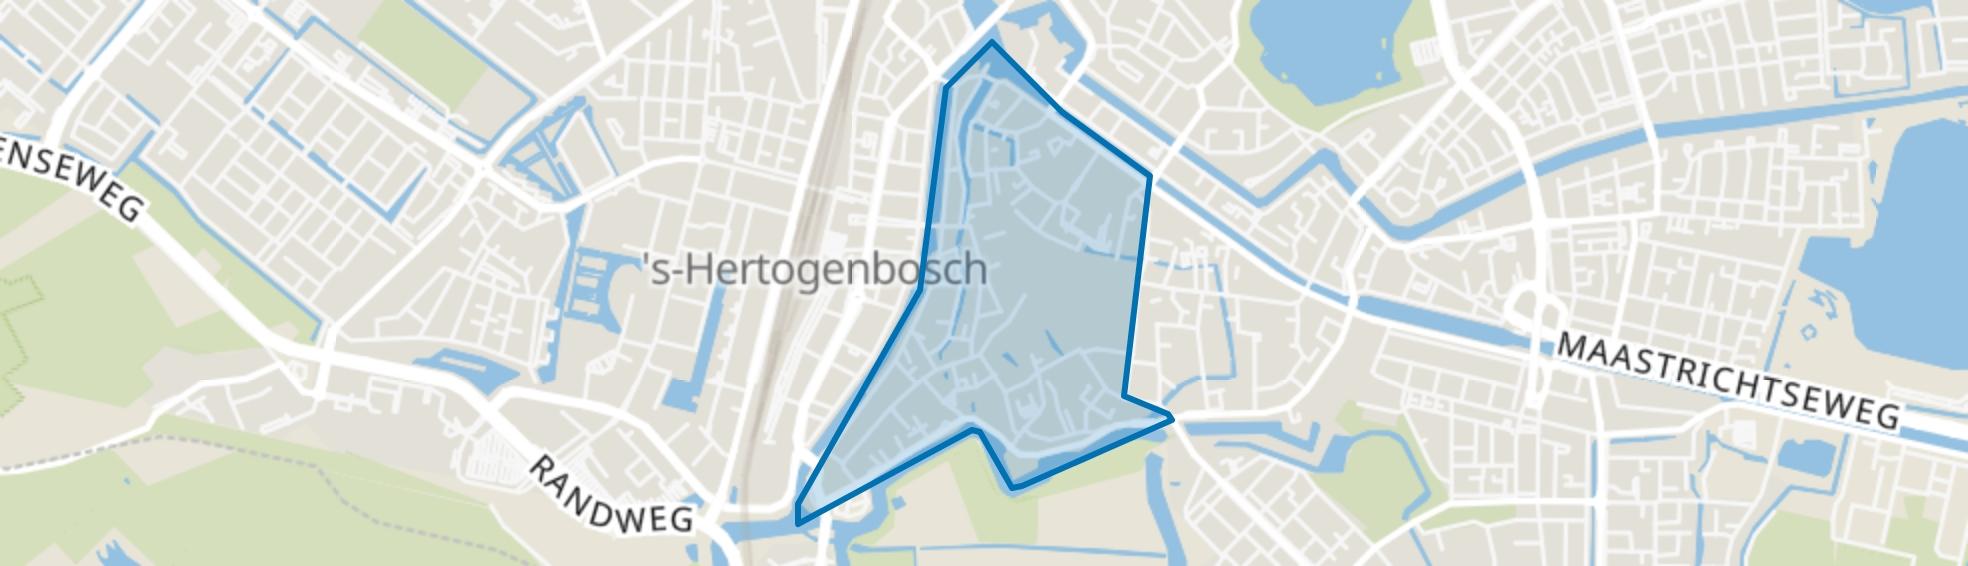 Binnenstad-Centrum, Den Bosch map